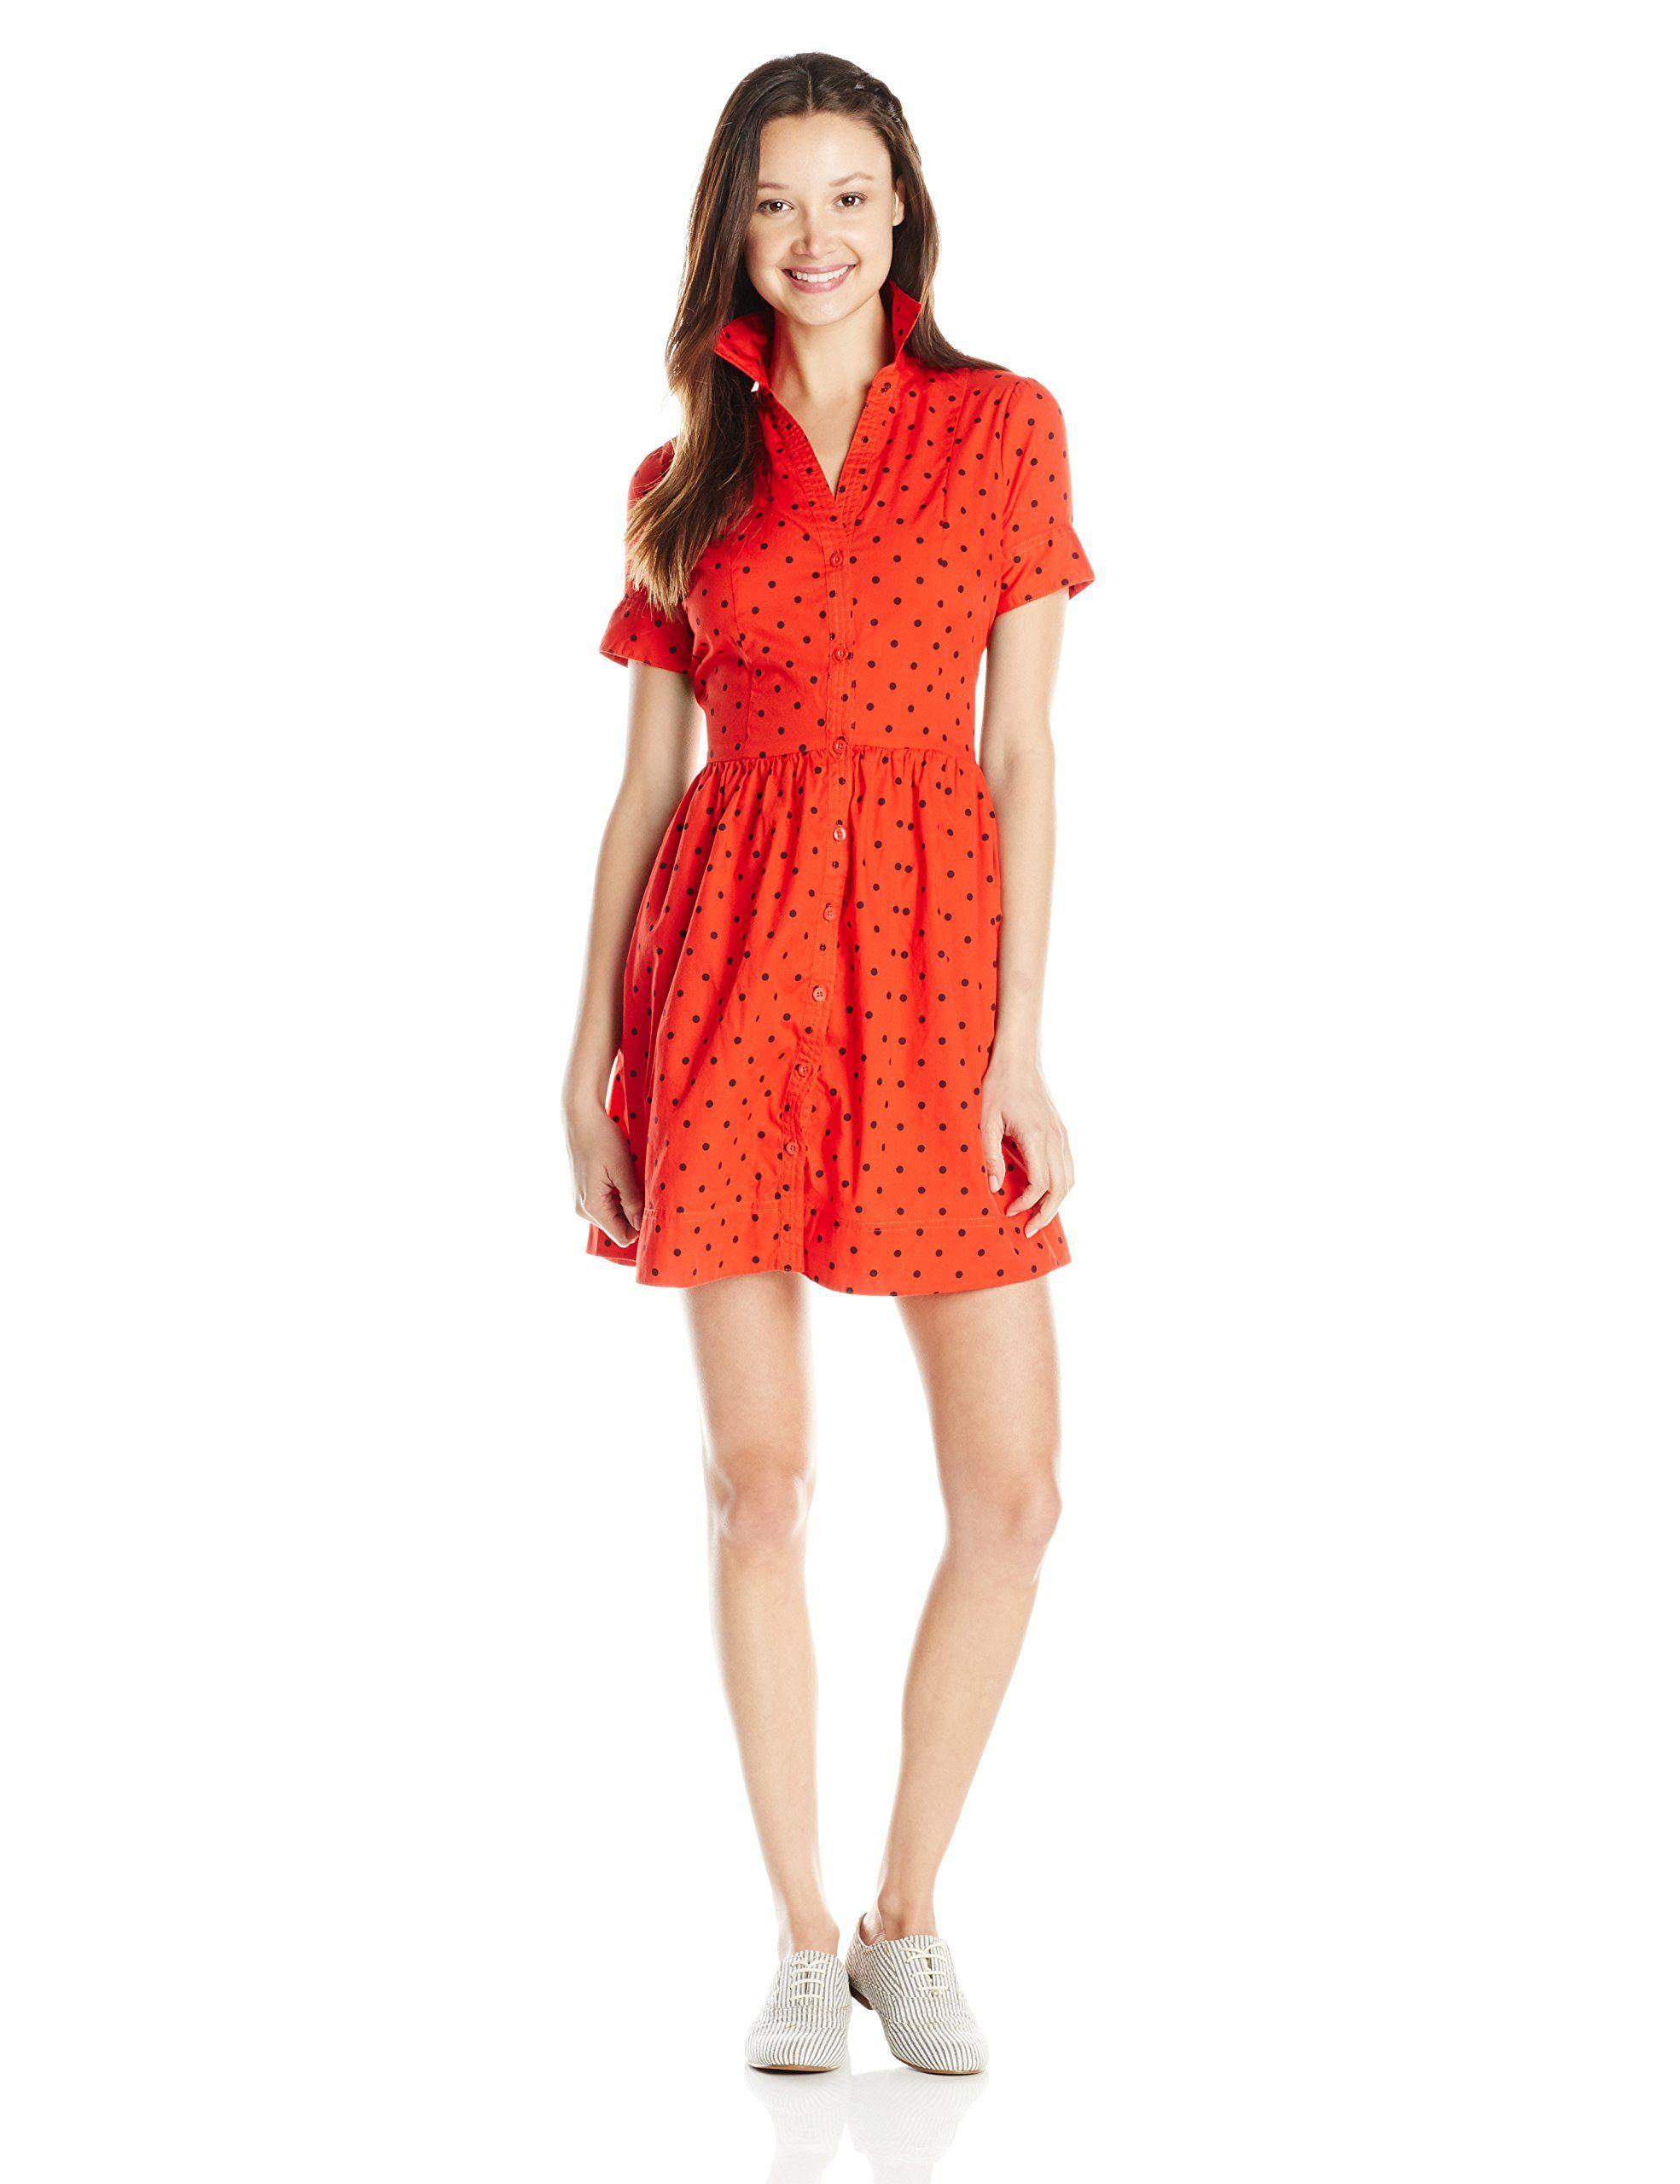 U.S. Polo Assn. Junior's Printed Poplin Dress | Amazon.com